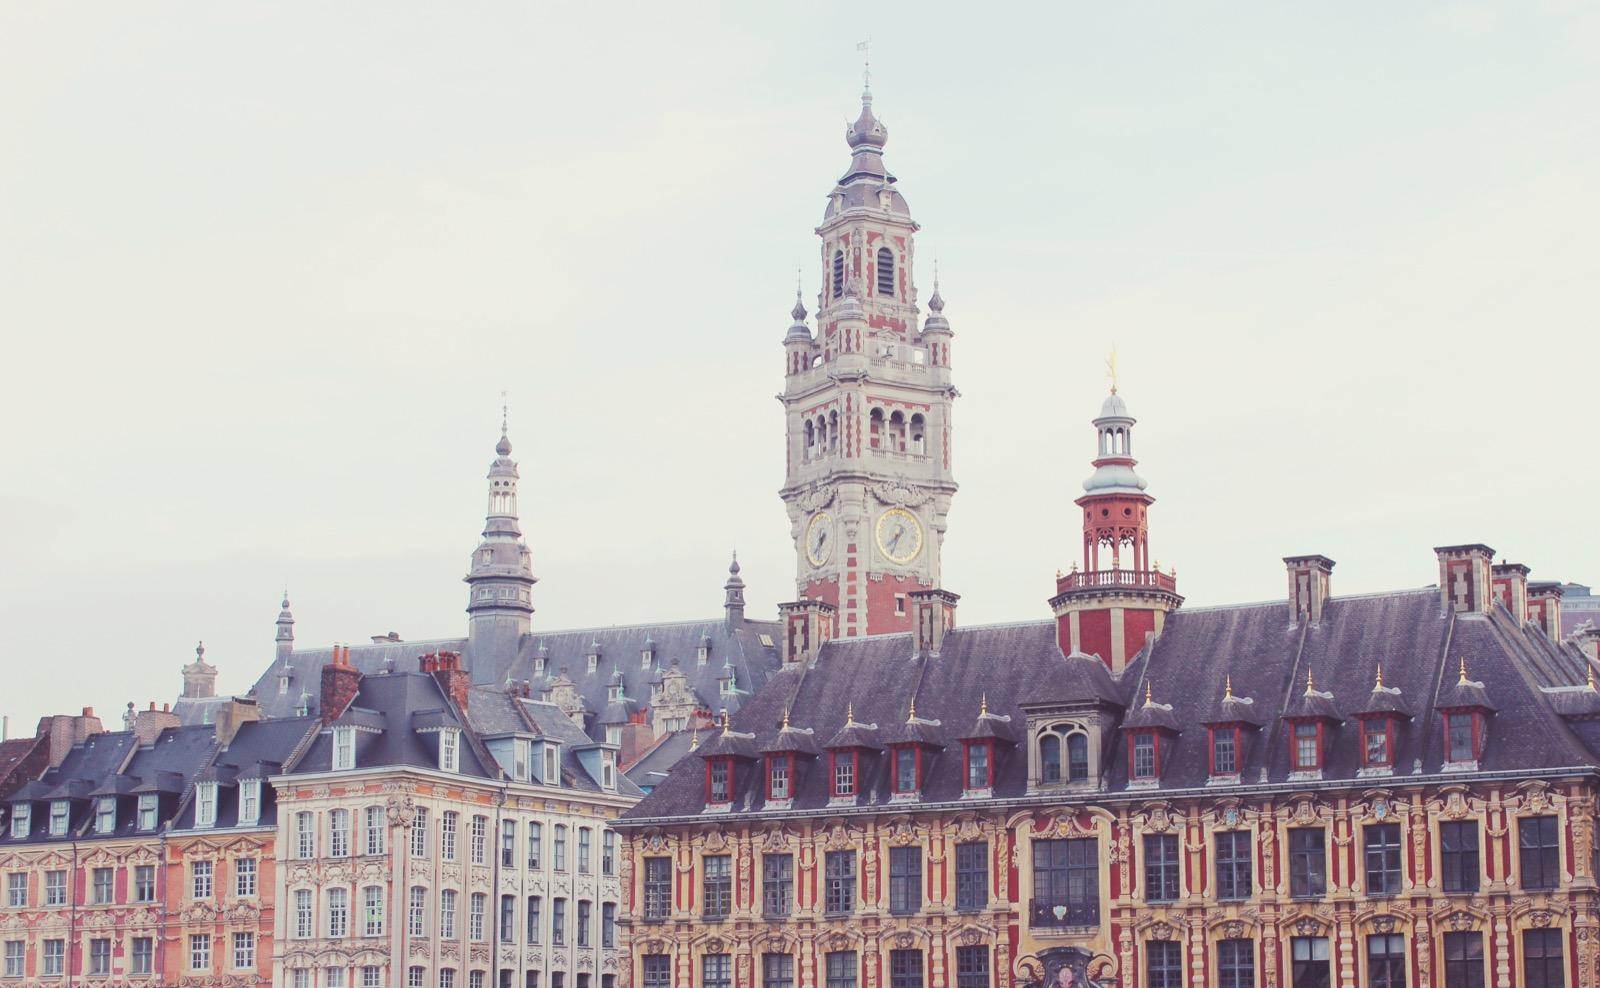 Lille's beautiful main square